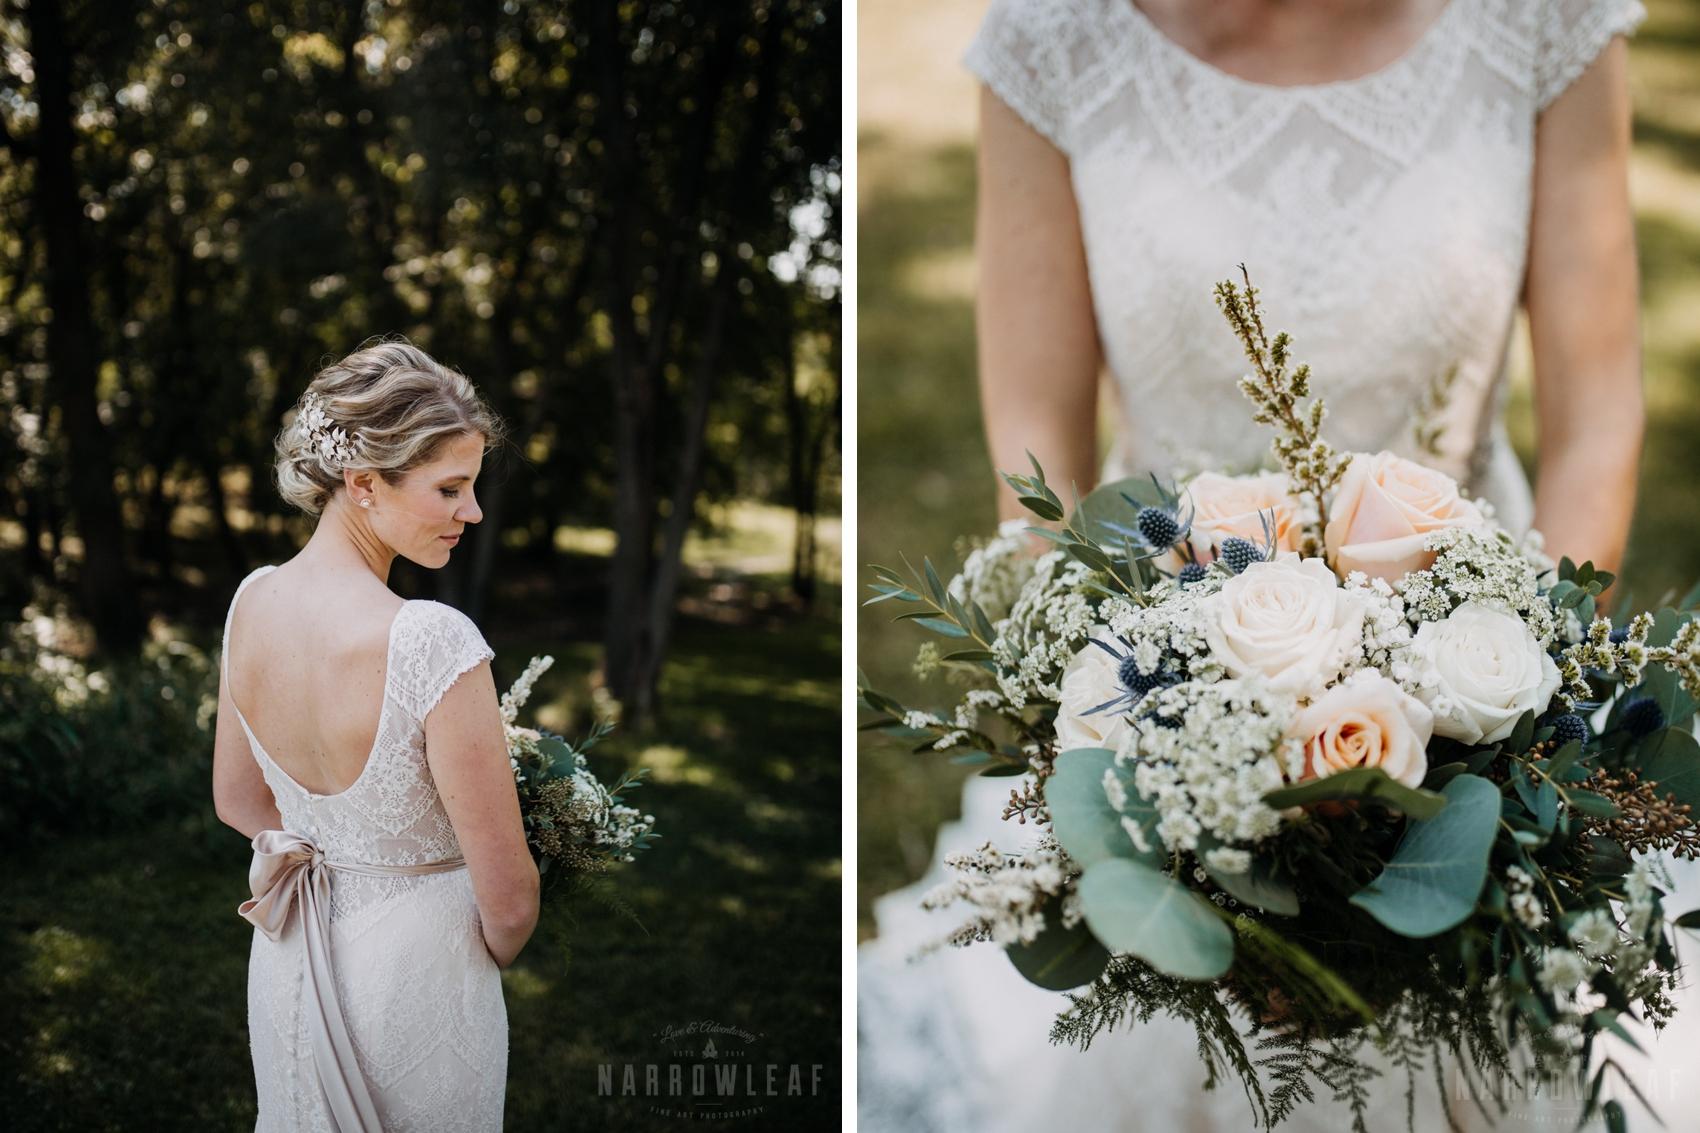 farm-wedding-bride-groom-photos-in-south-haven-mn-013-014.jpg